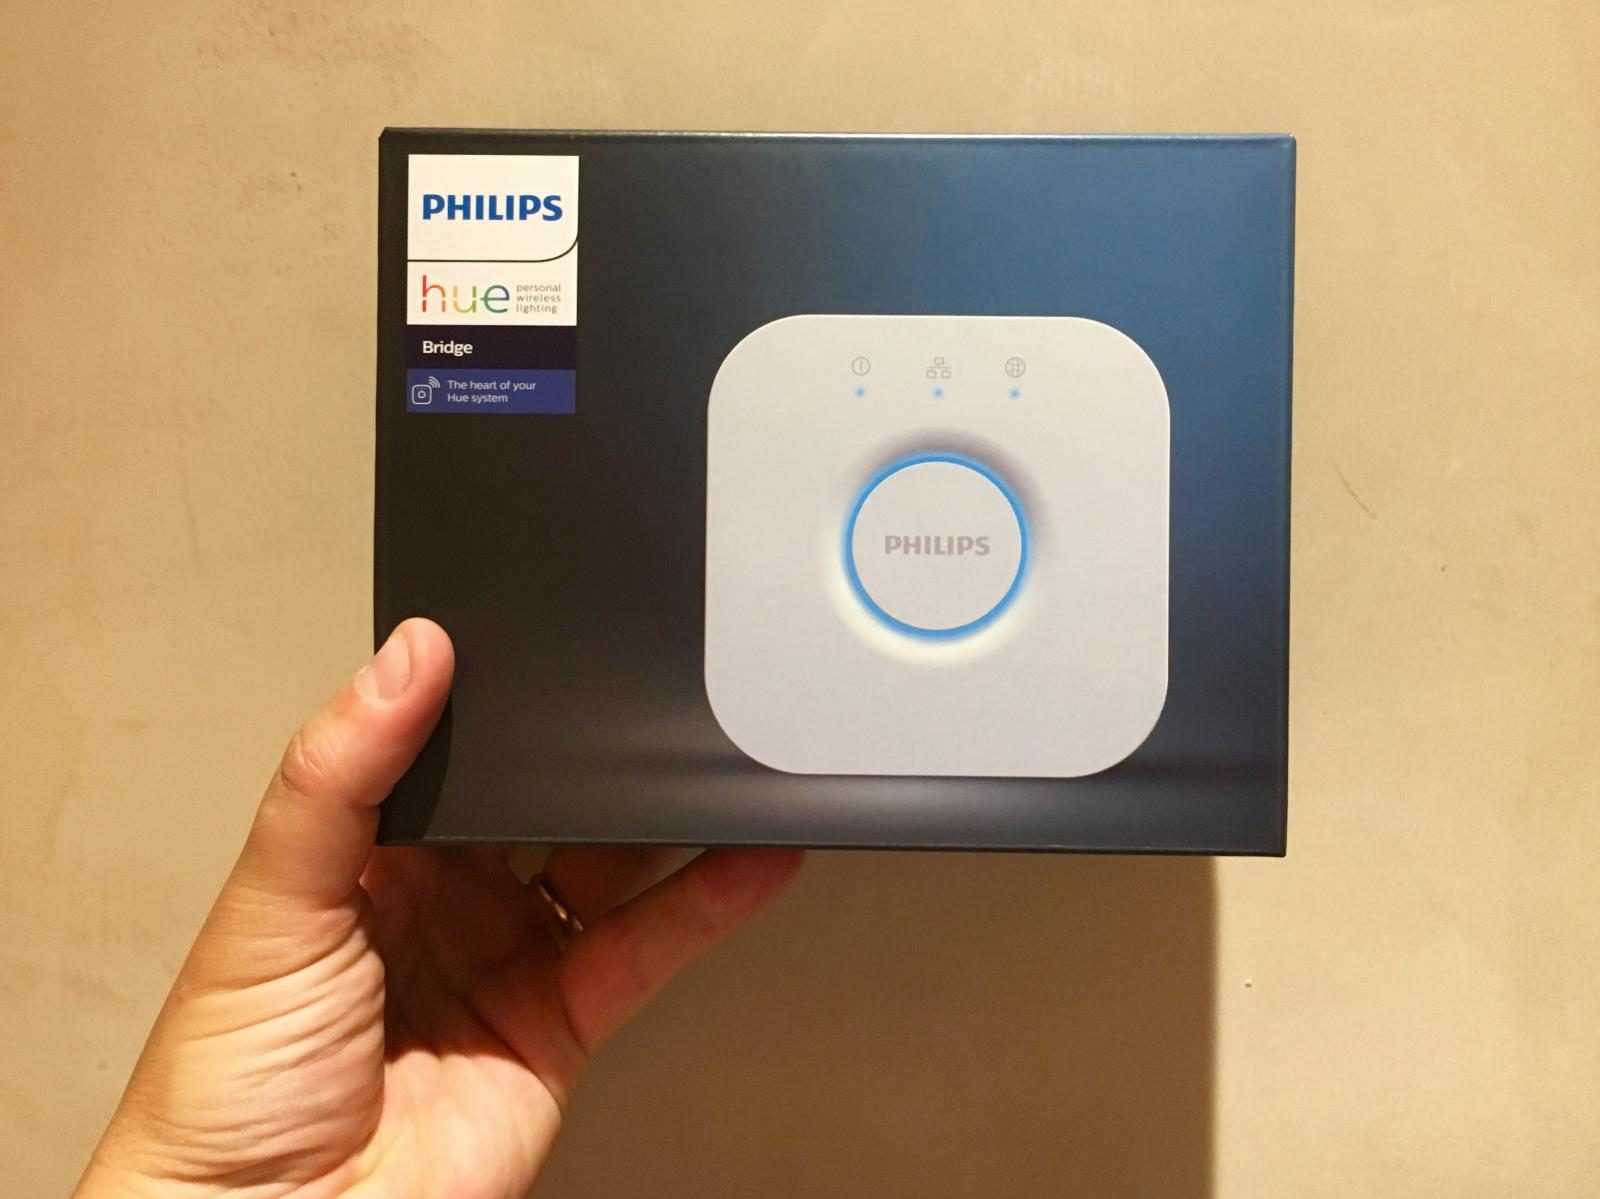 Philips Hue Bridge boxed